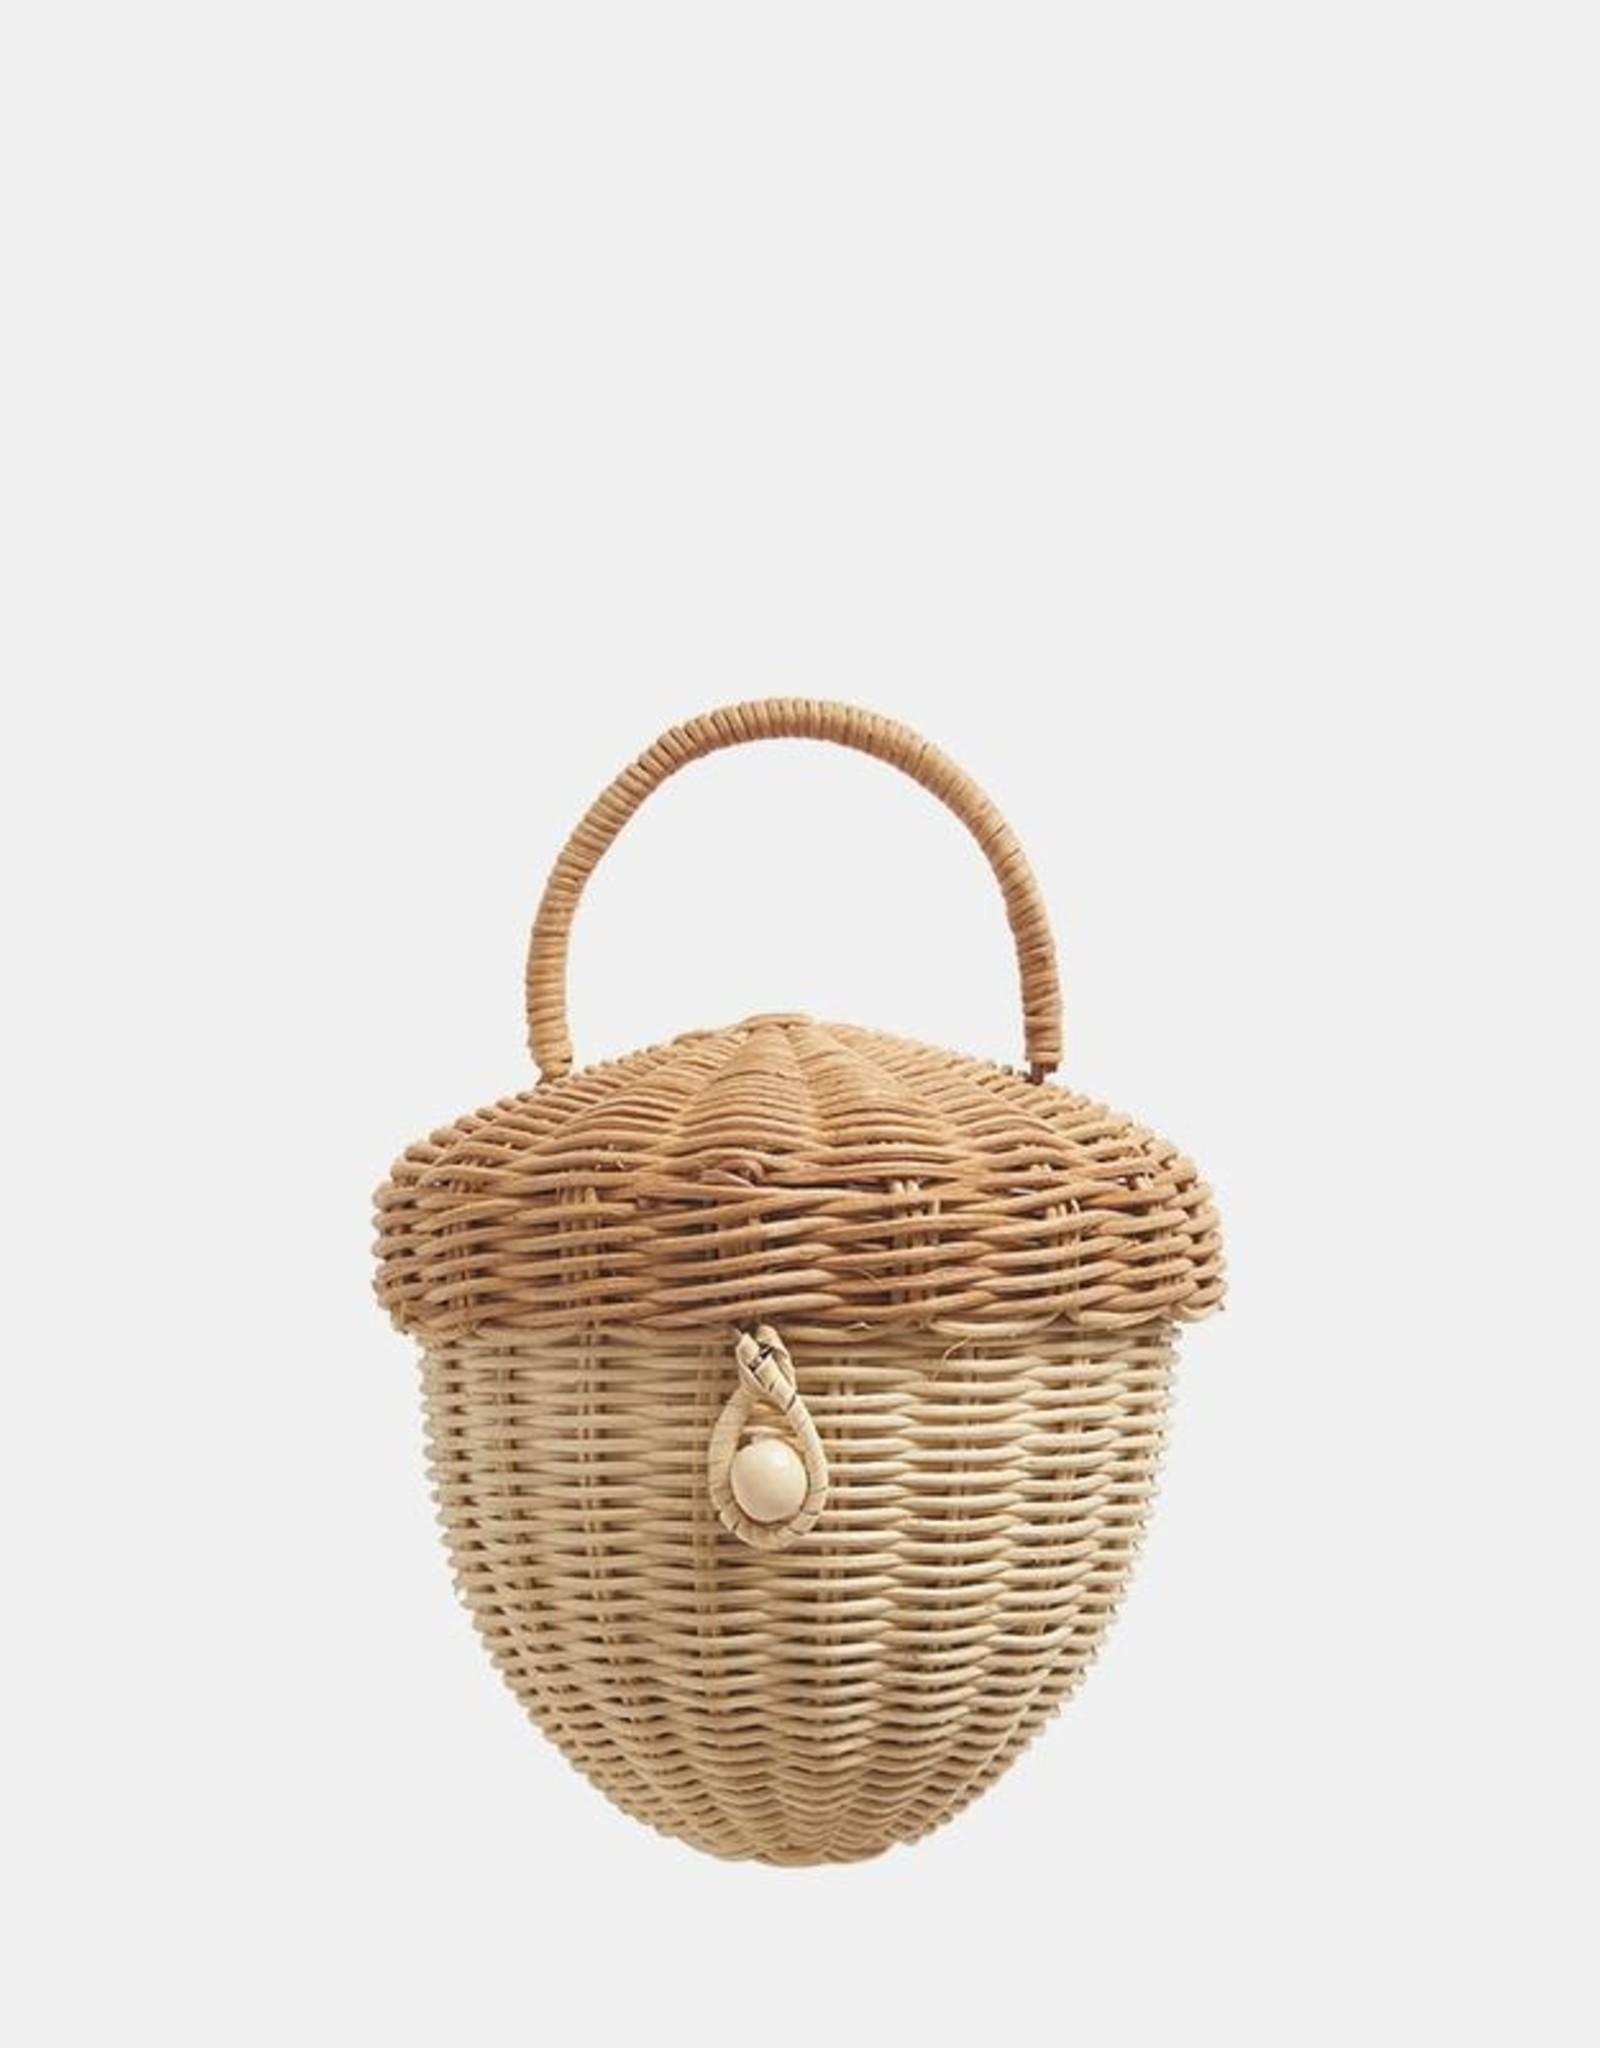 Olli Ella Olli Ella - Acorn Bag